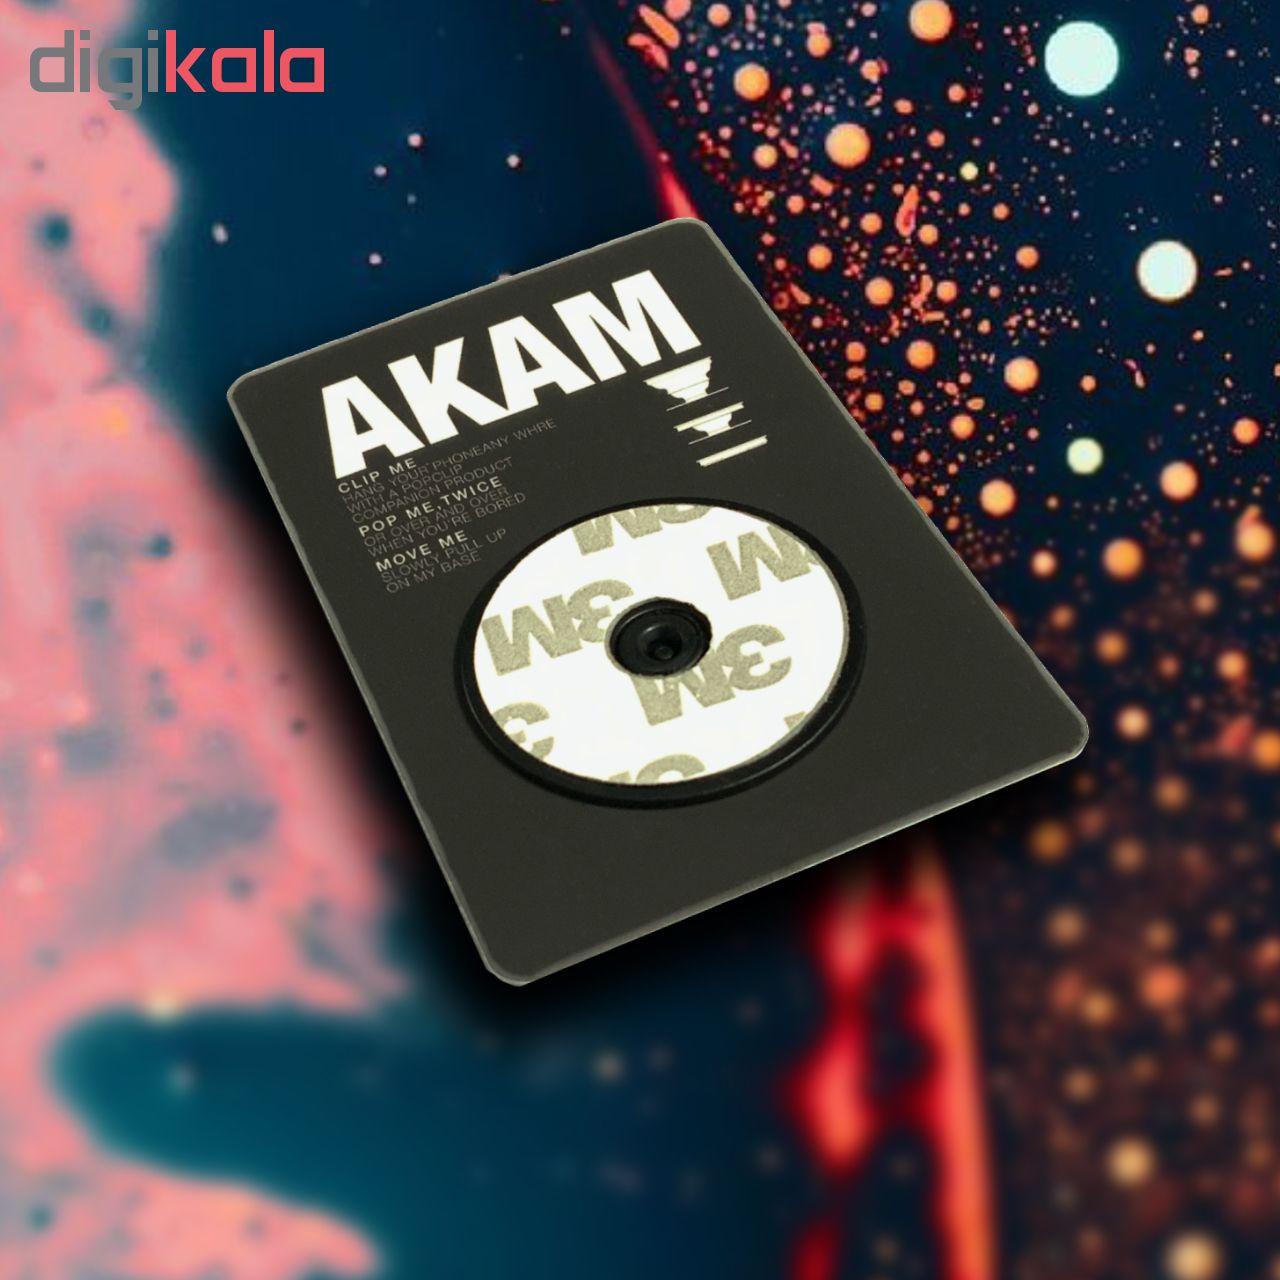 پایه نگهدارنده گوشی موبایل پاپ سوکت آکام مدل APS0056 main 1 2